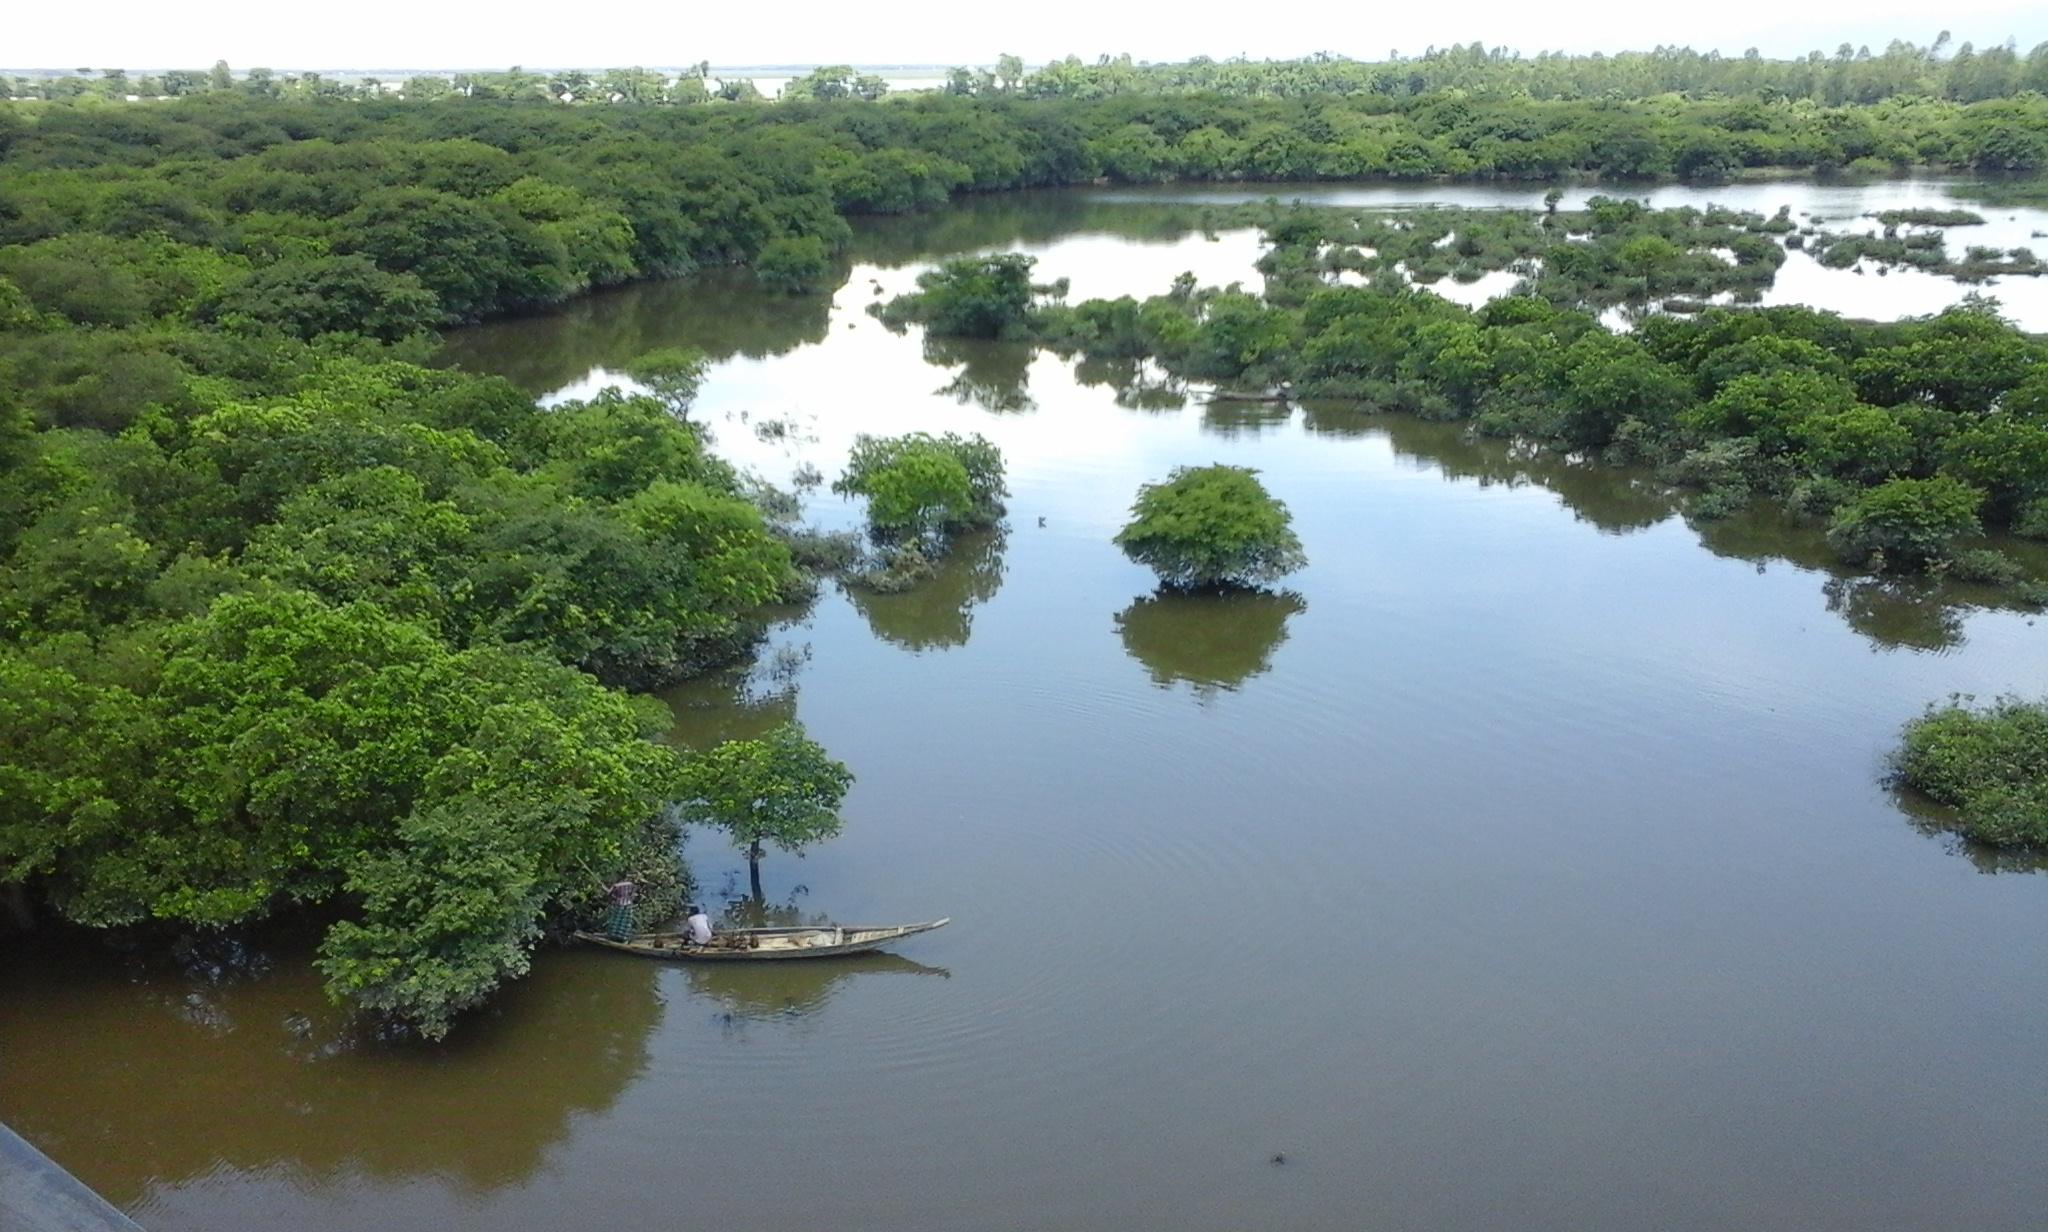 Wetland - Wikipedia